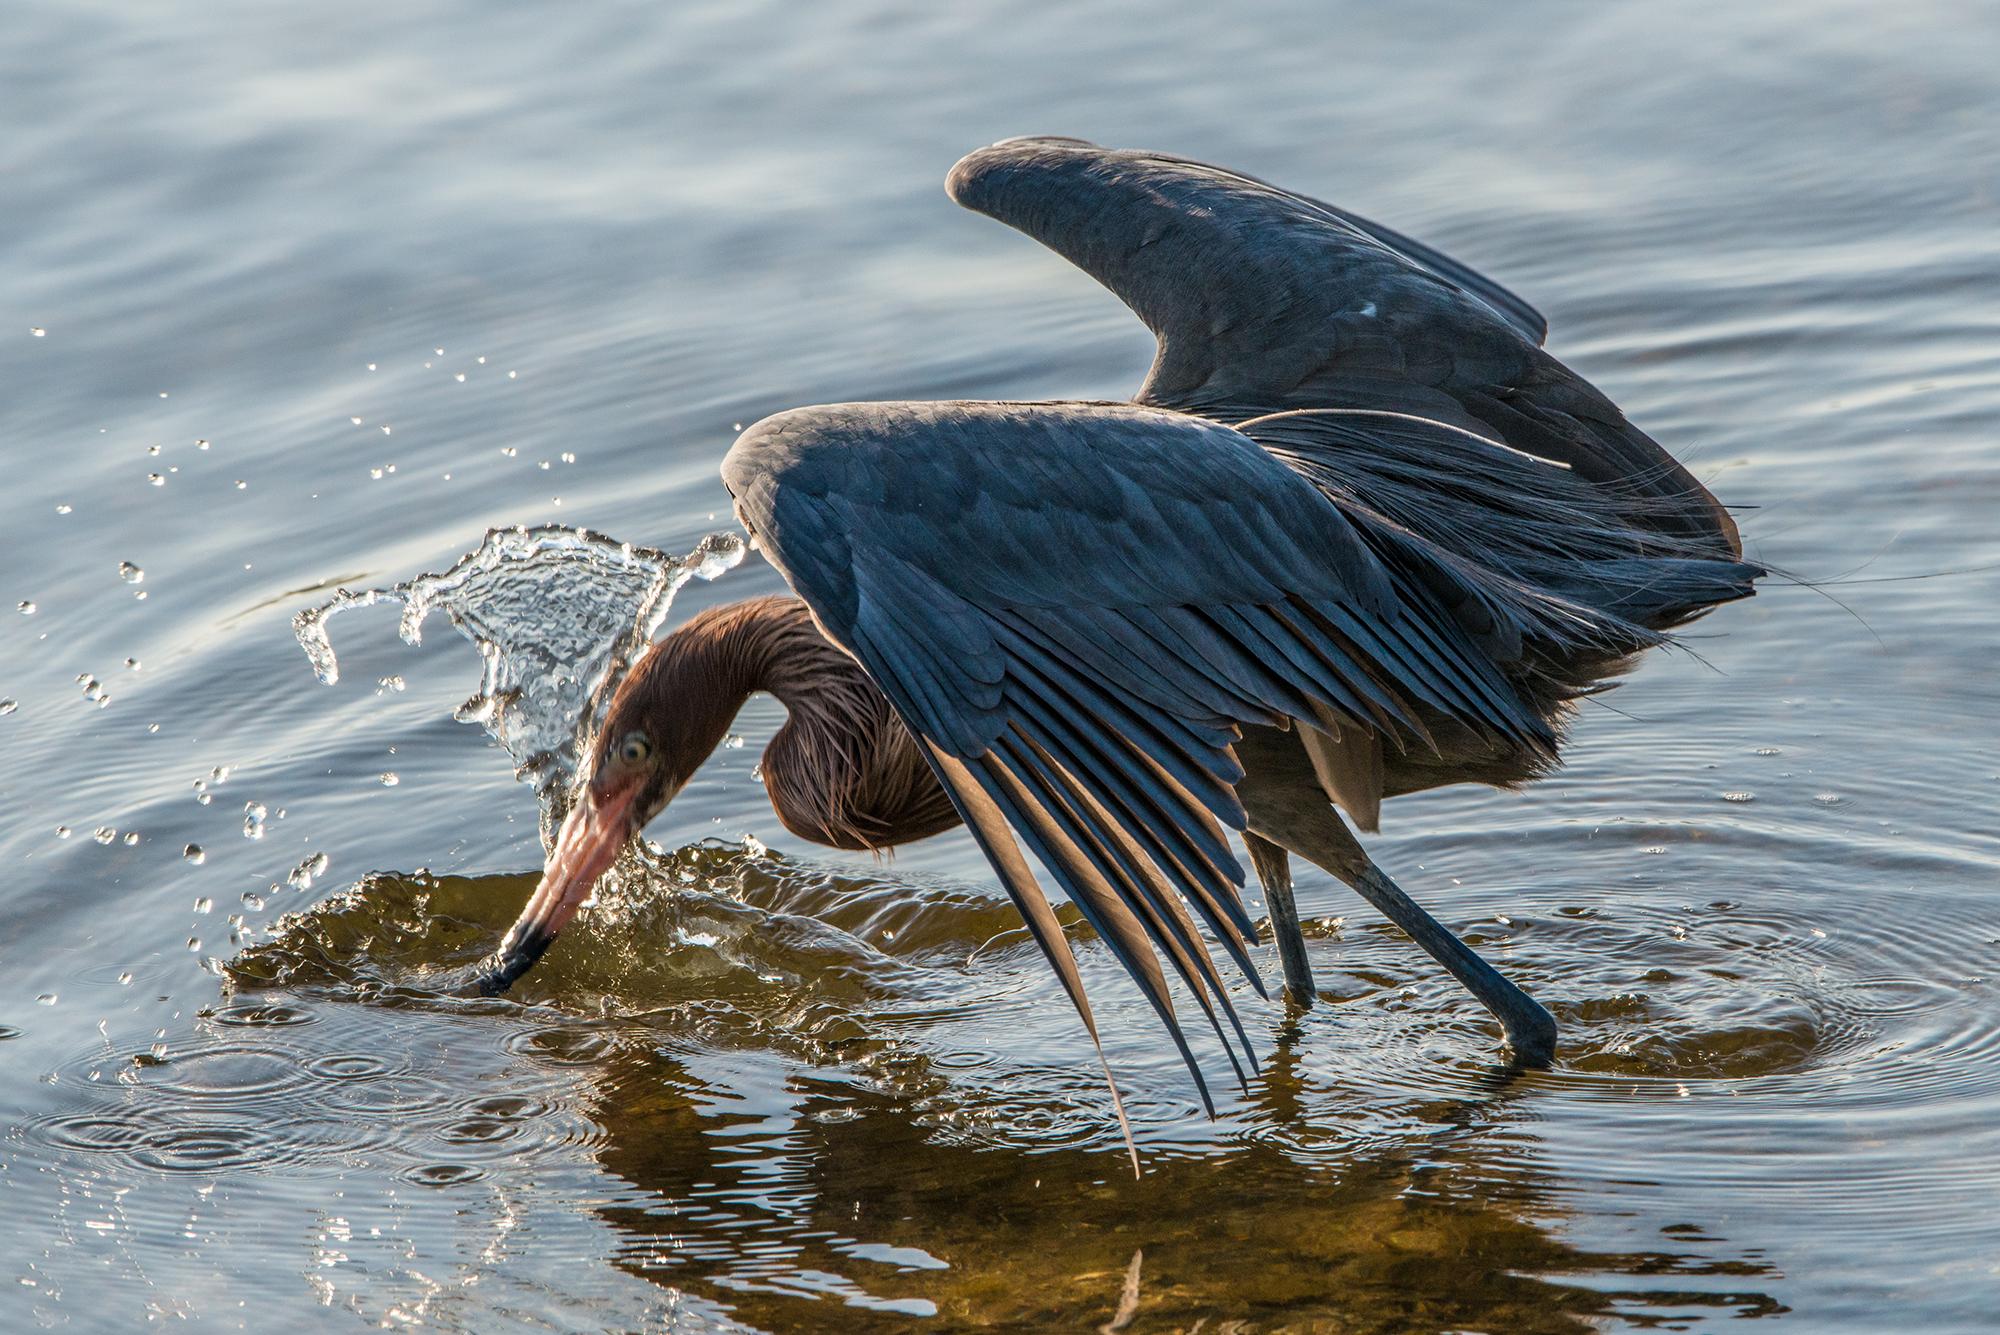 #reddishegret, #bird, #wadingbird, #heron, #sanibel, #dingdarling, #fishing, #behavior, #dance, #tamron, #nikon, #florida